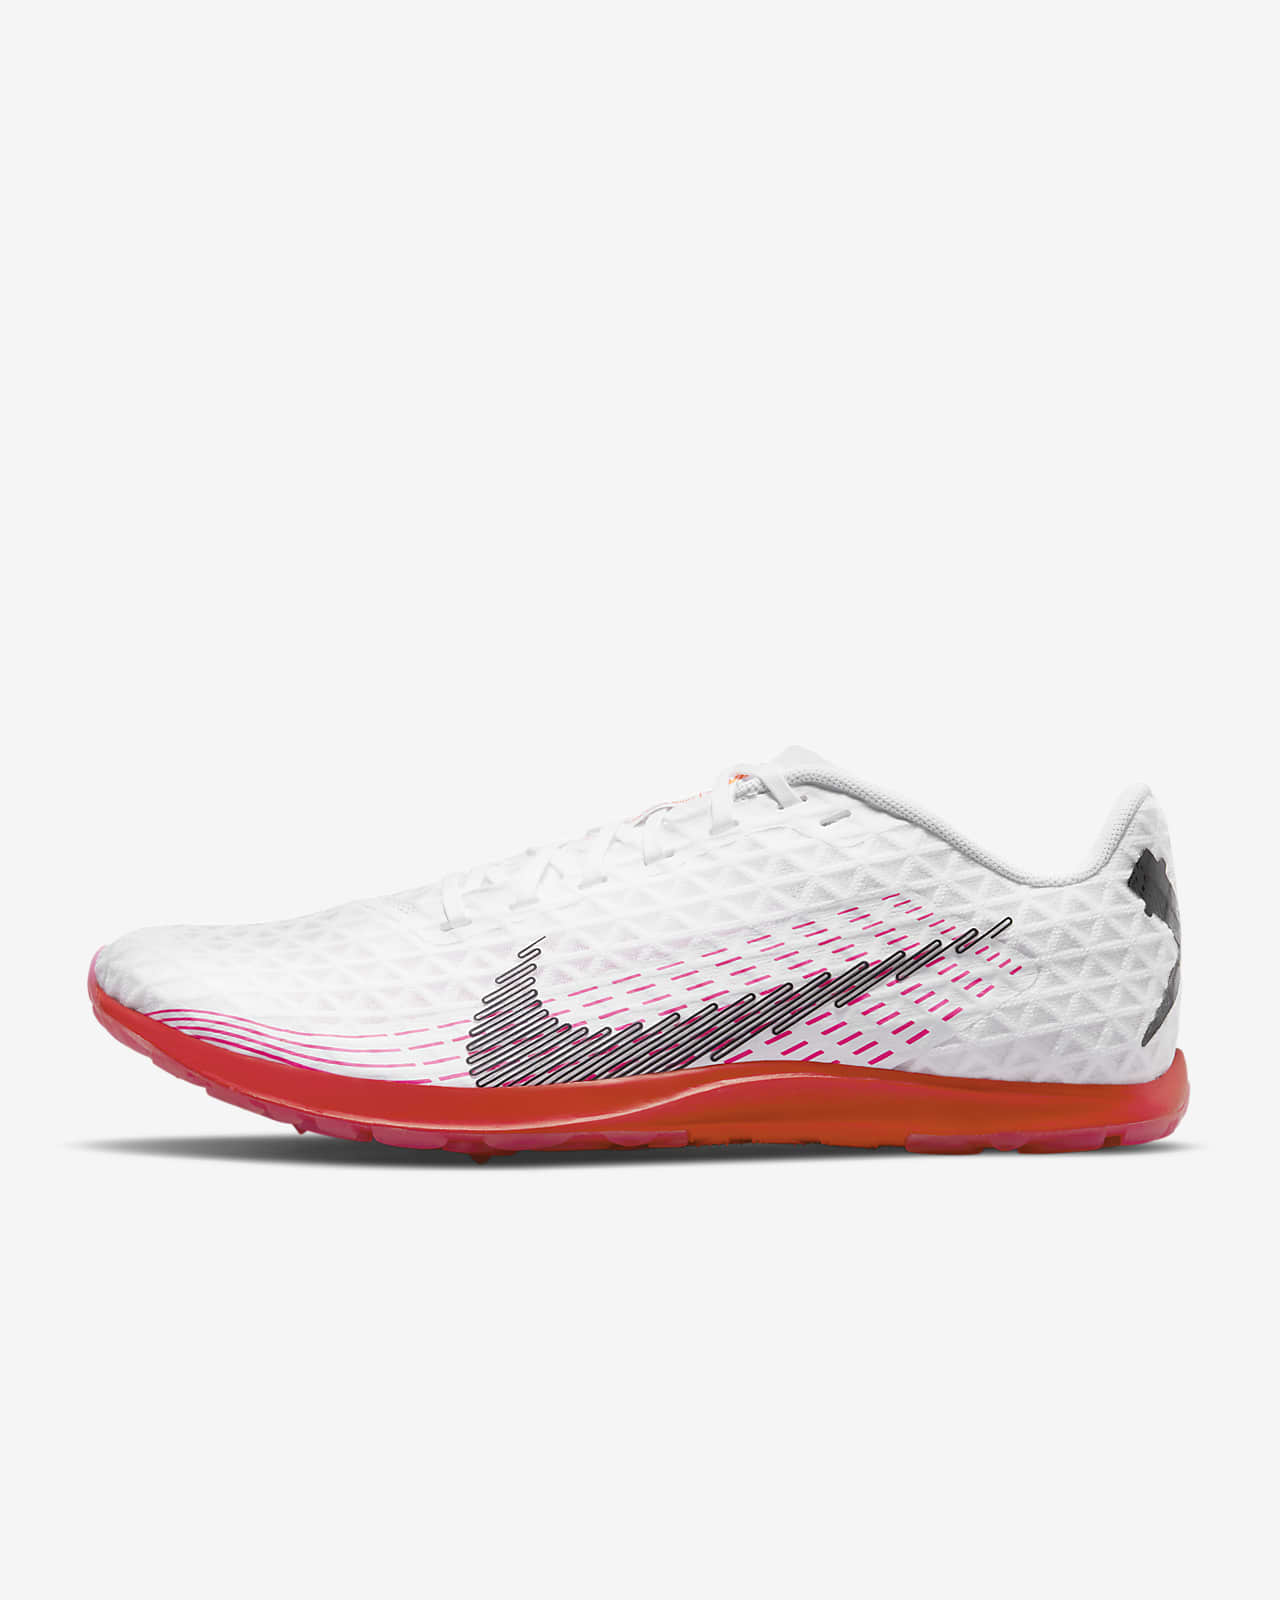 Nike Zoom Rival Waffle 5 Cross-Country Shoe